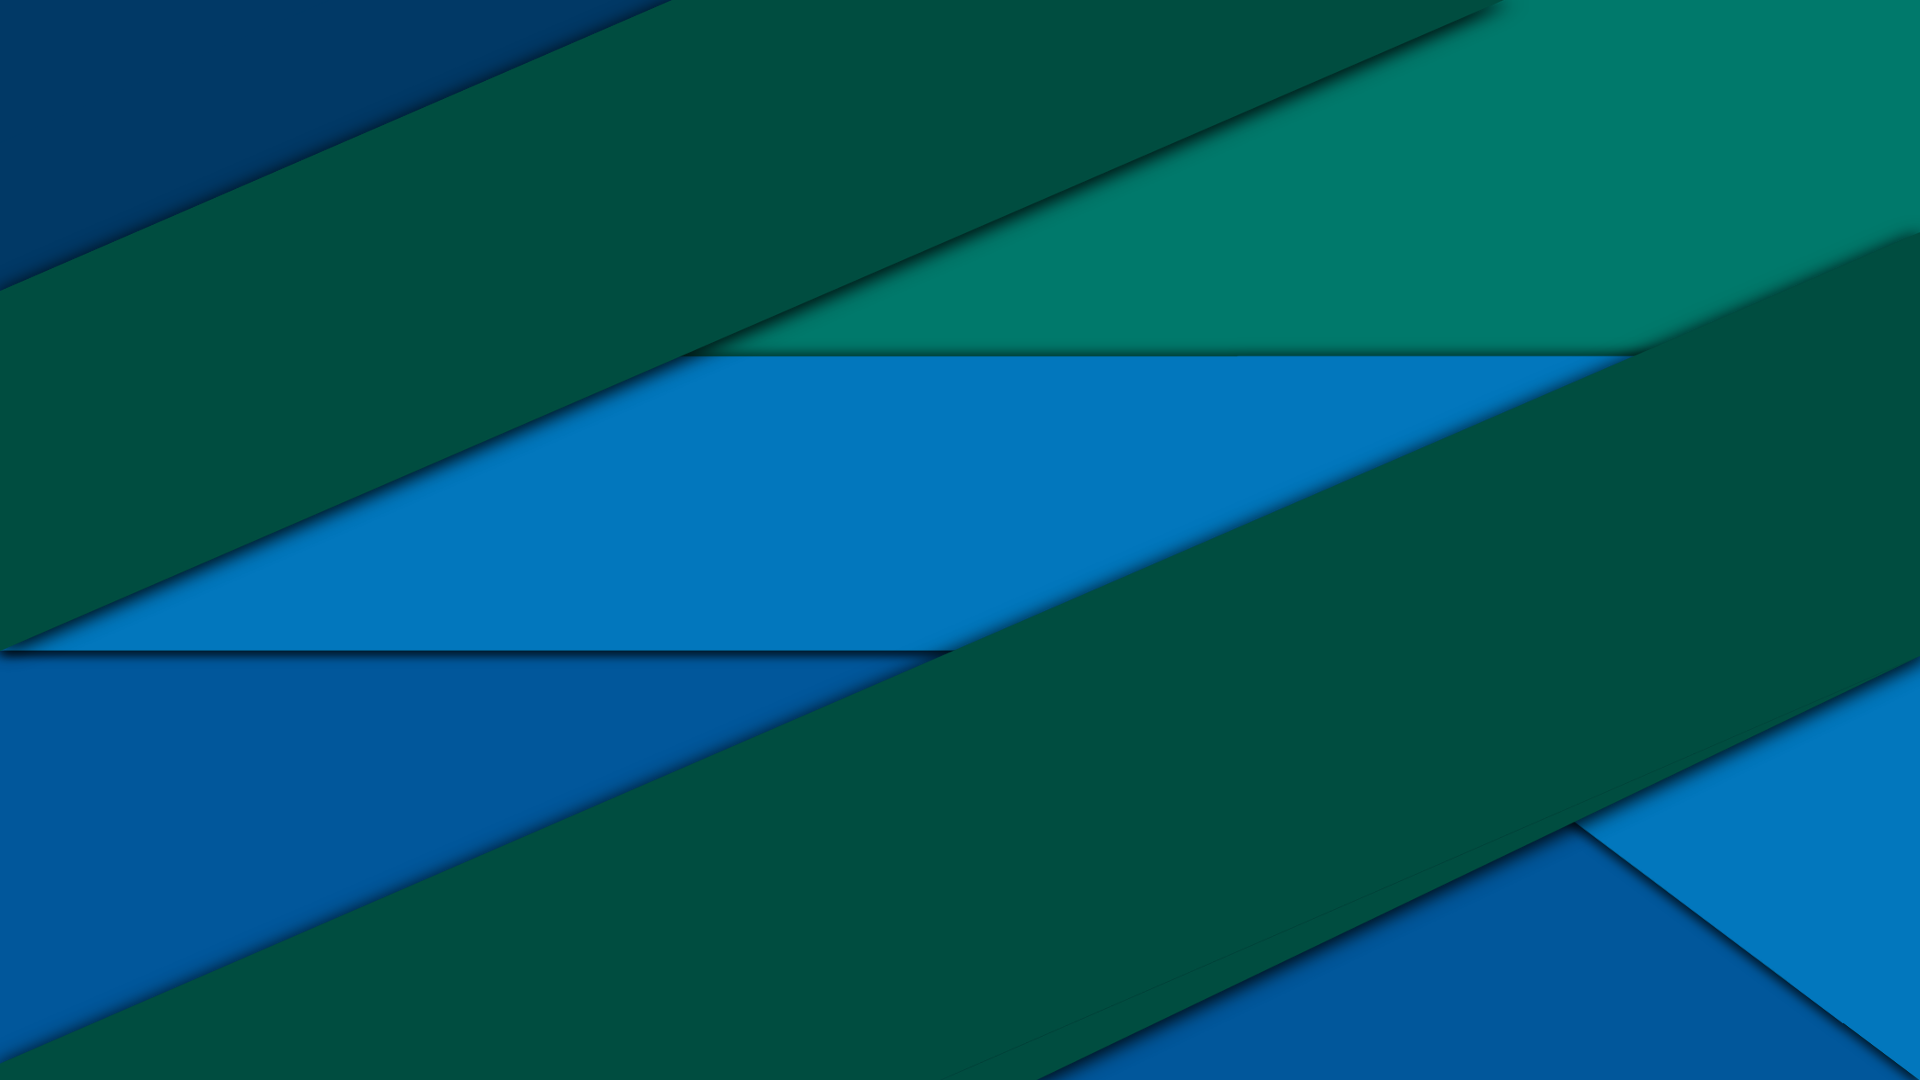 40 Best Material Design Wallpapers 4k 2016 Hd Windows 7 8